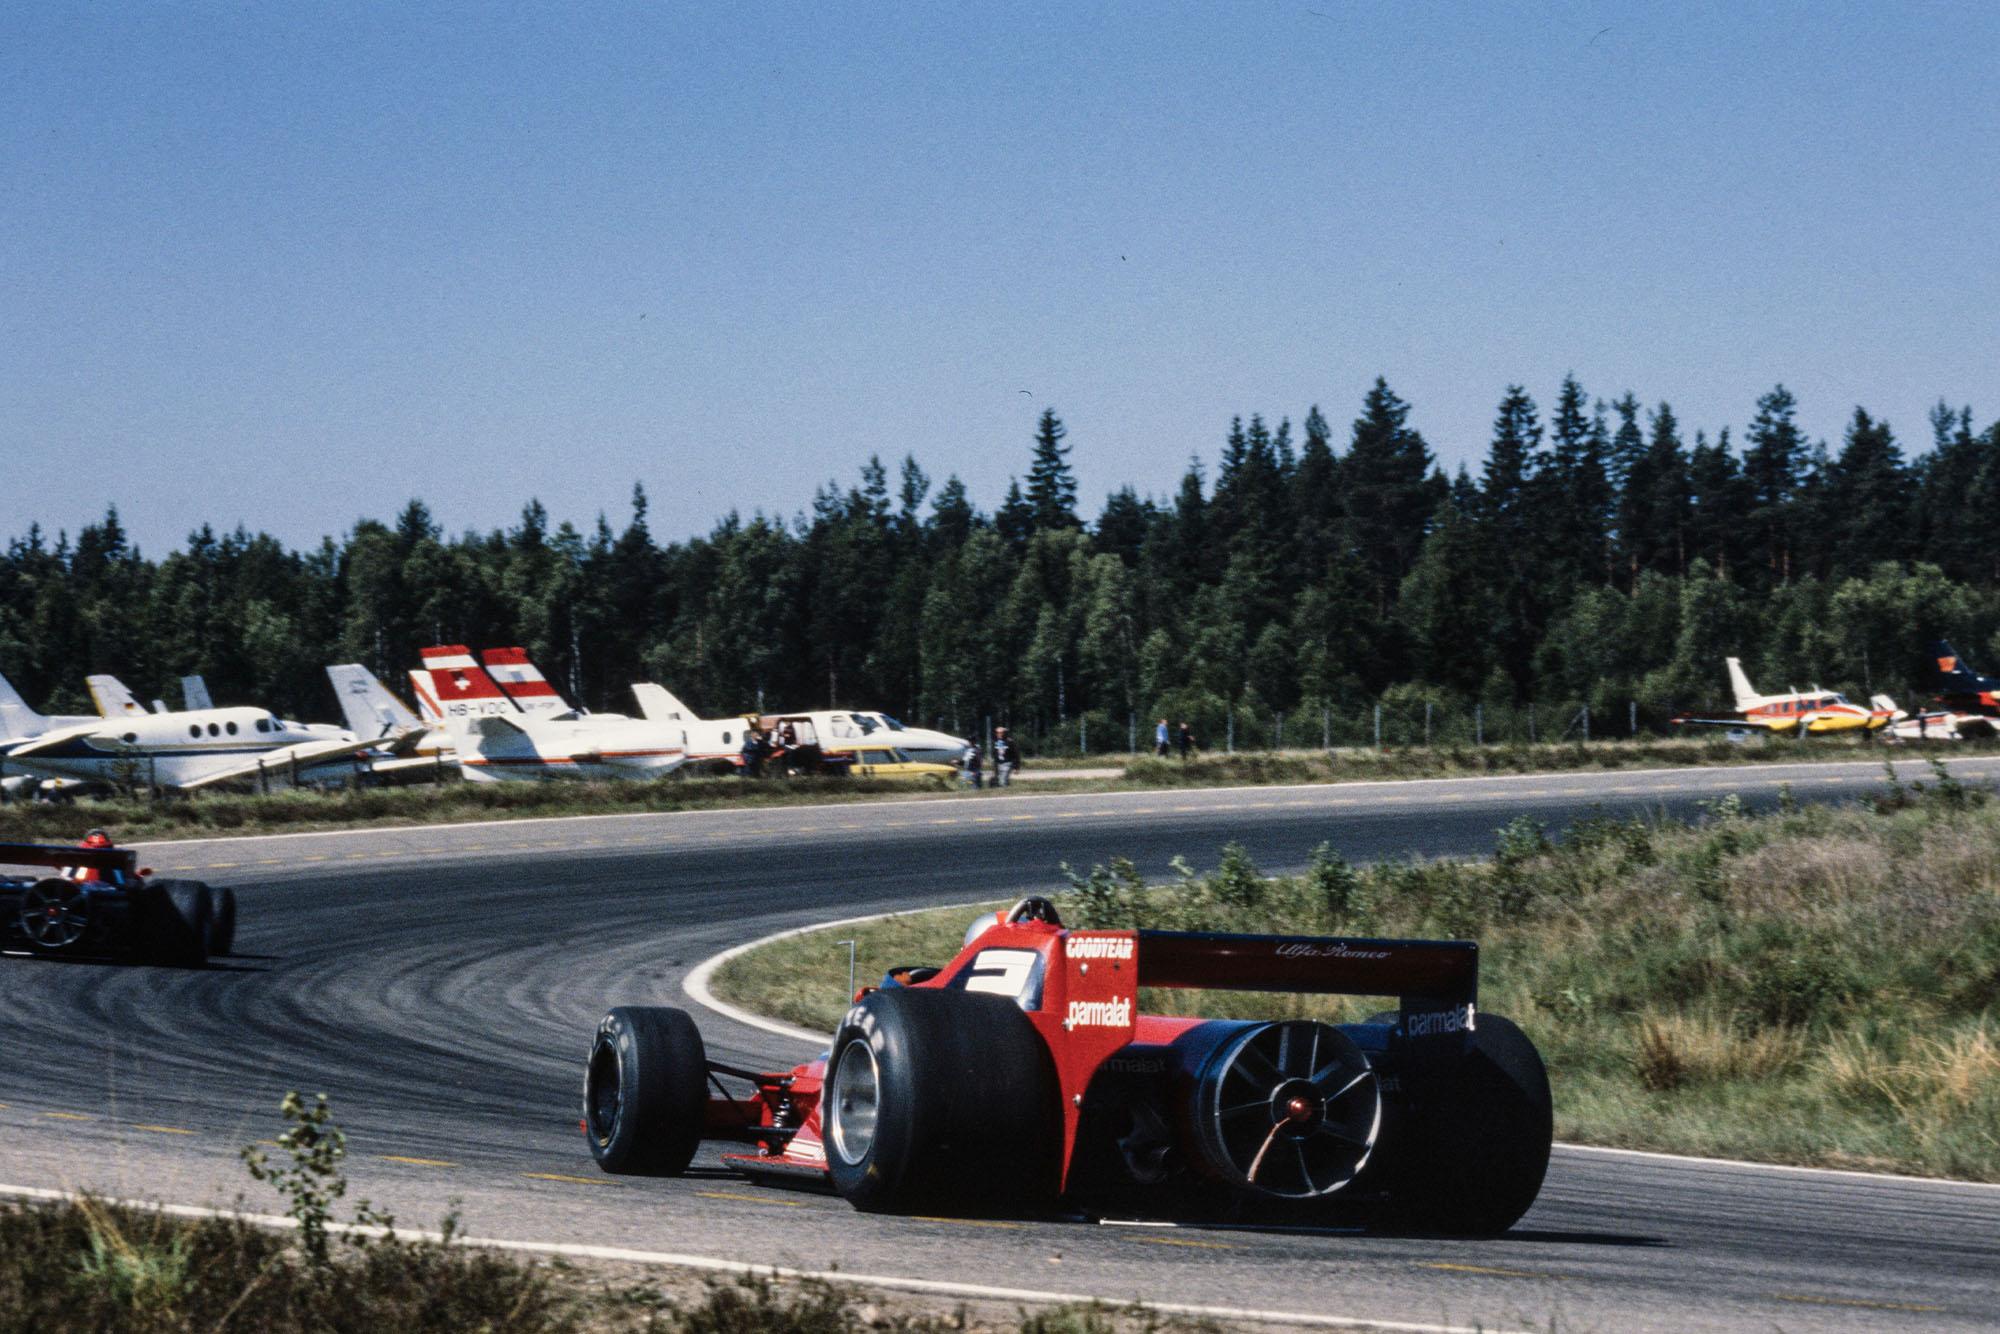 Niki Lauda leads Brabham team-mate at the 1978 Swedish Grand Prix, AnderstorpJohn Watson